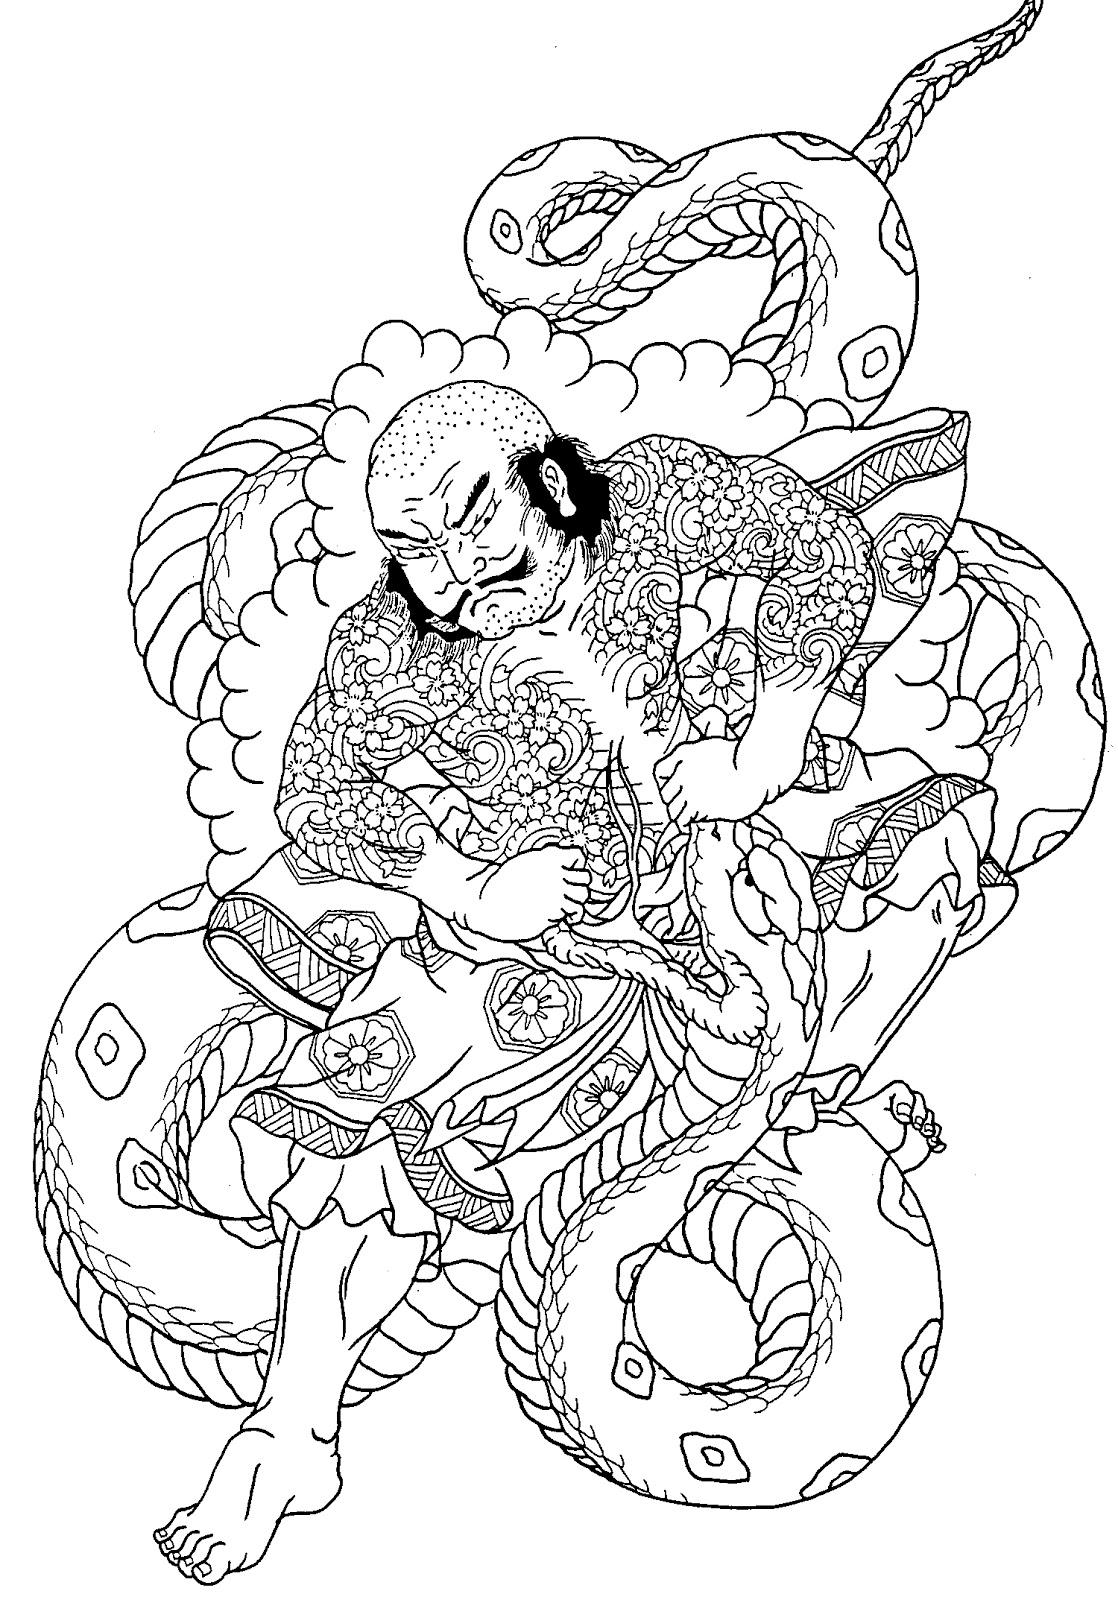 Every tattoo is here 20 good looking samurai tattoo flash - Dessin dragon japonais ...